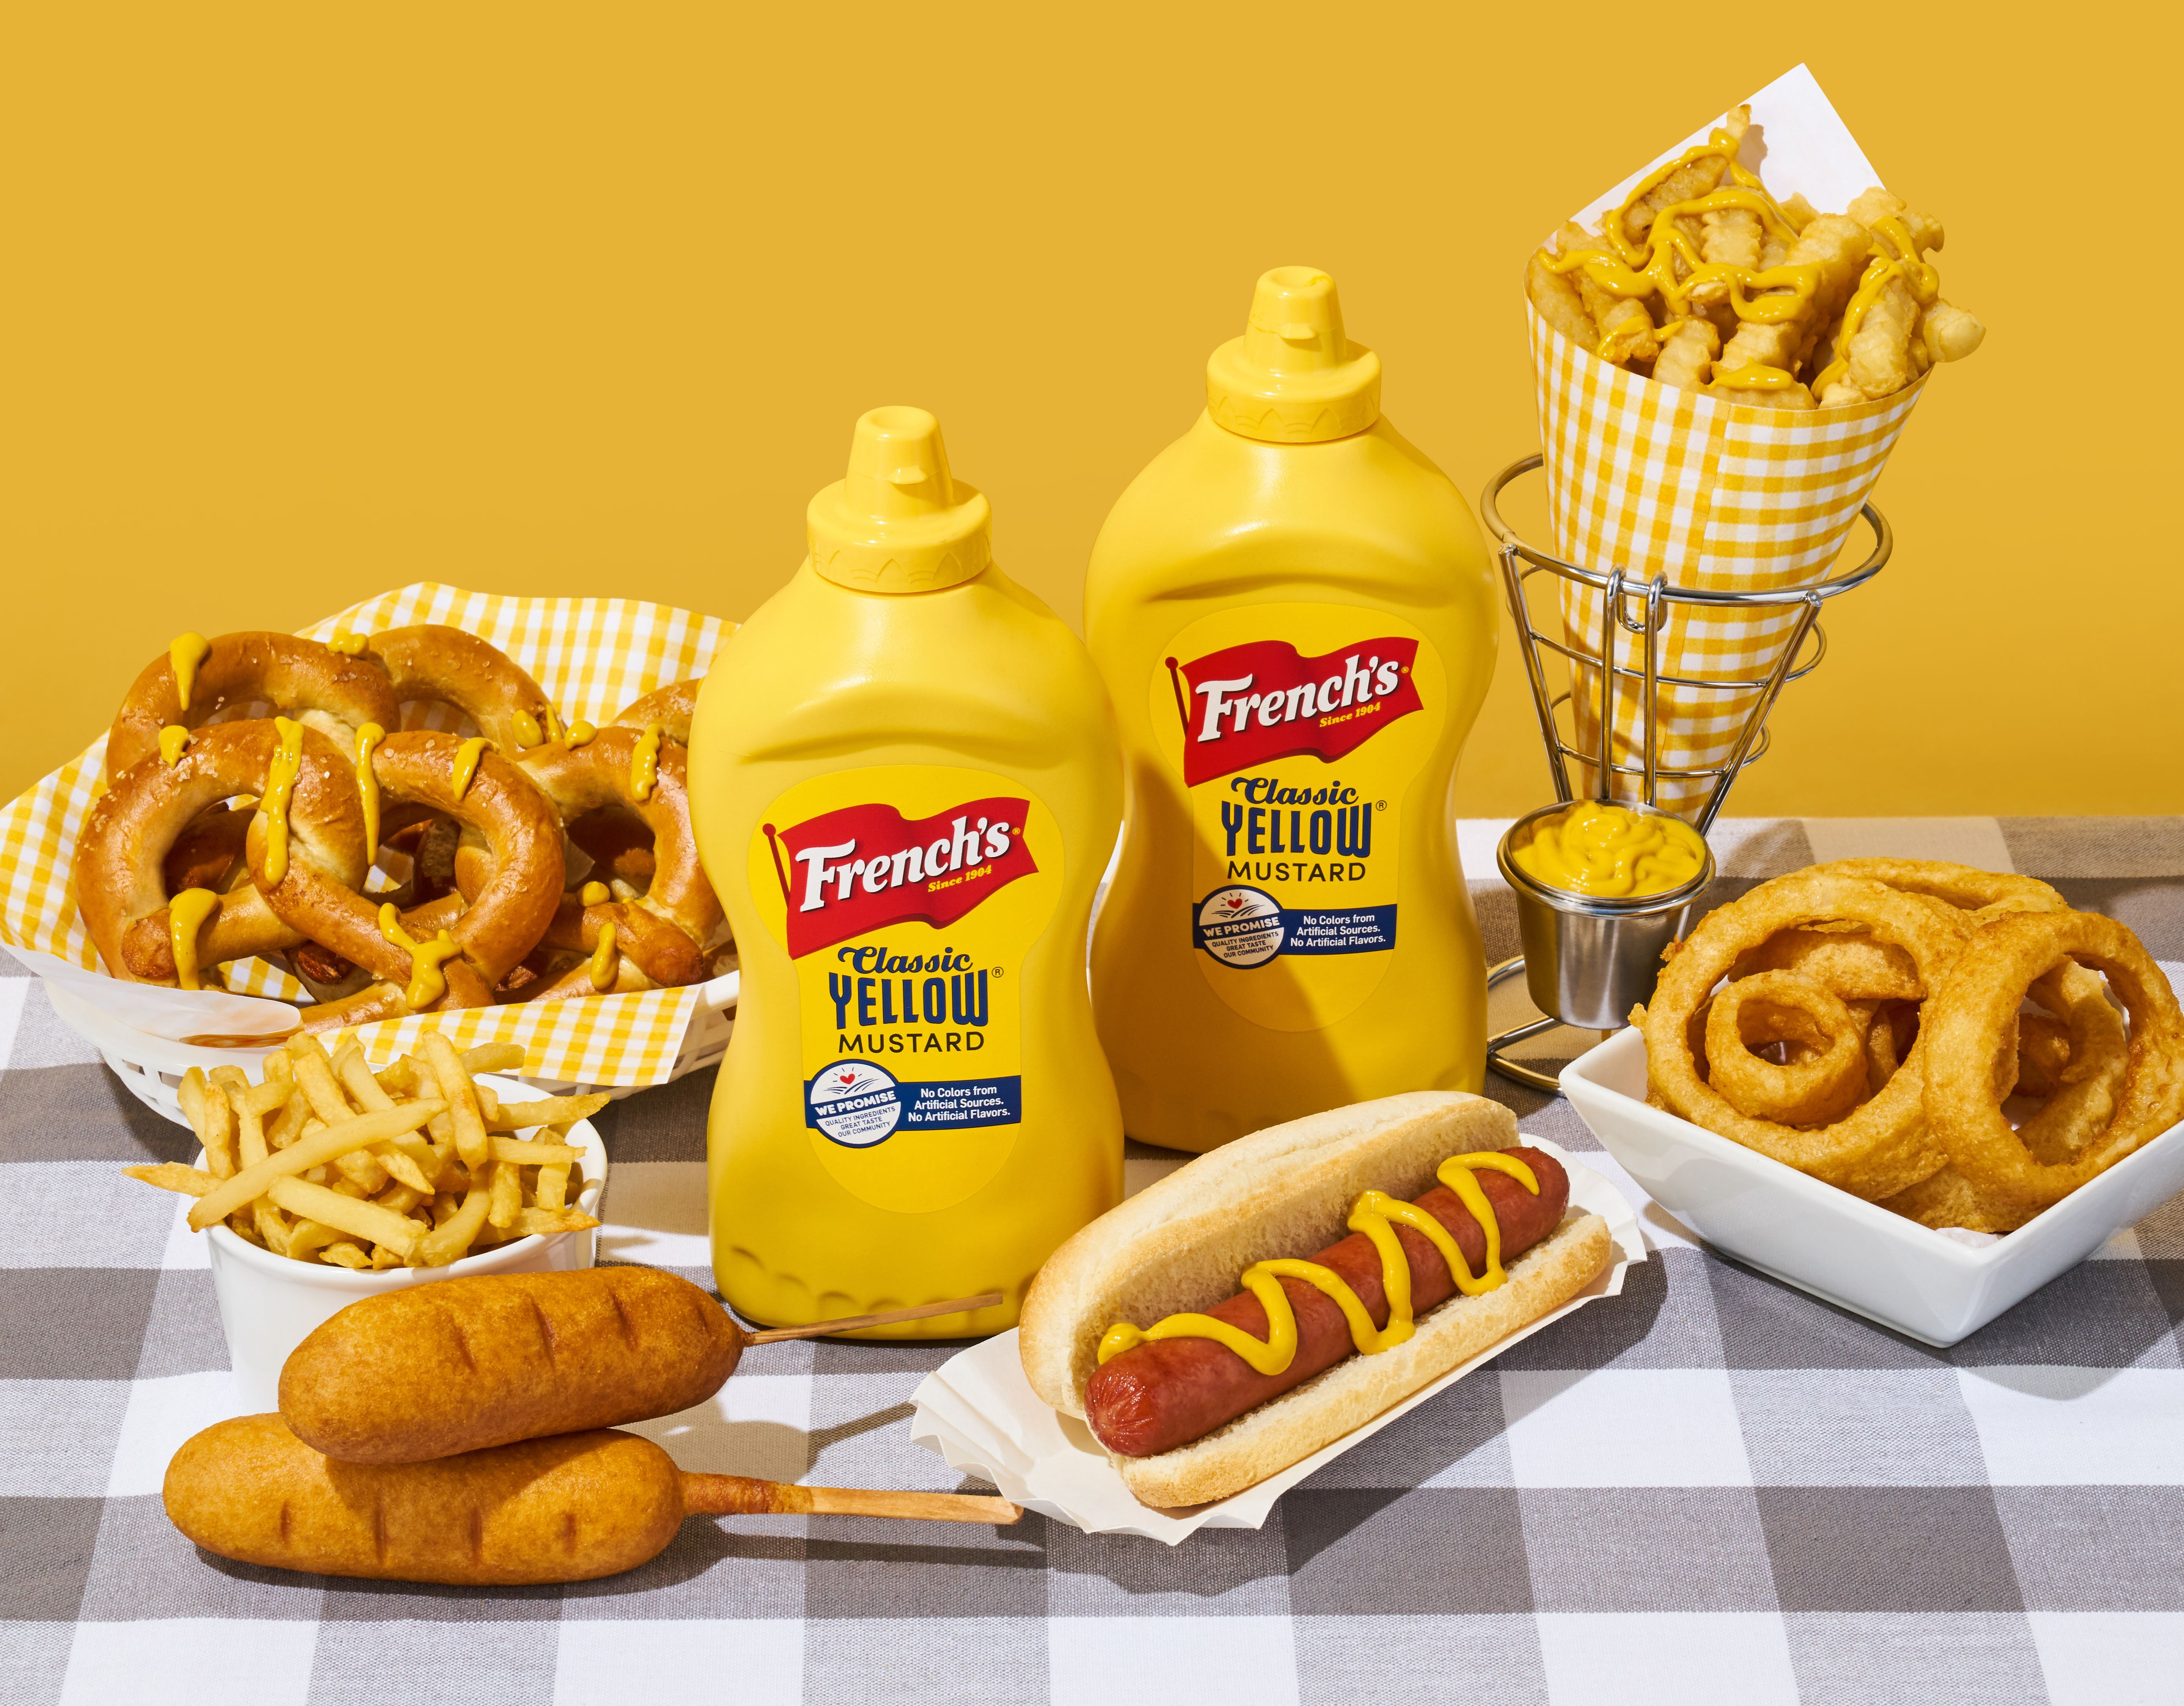 Frenchs yellow mustard in 2020 frenchs yellow mustard